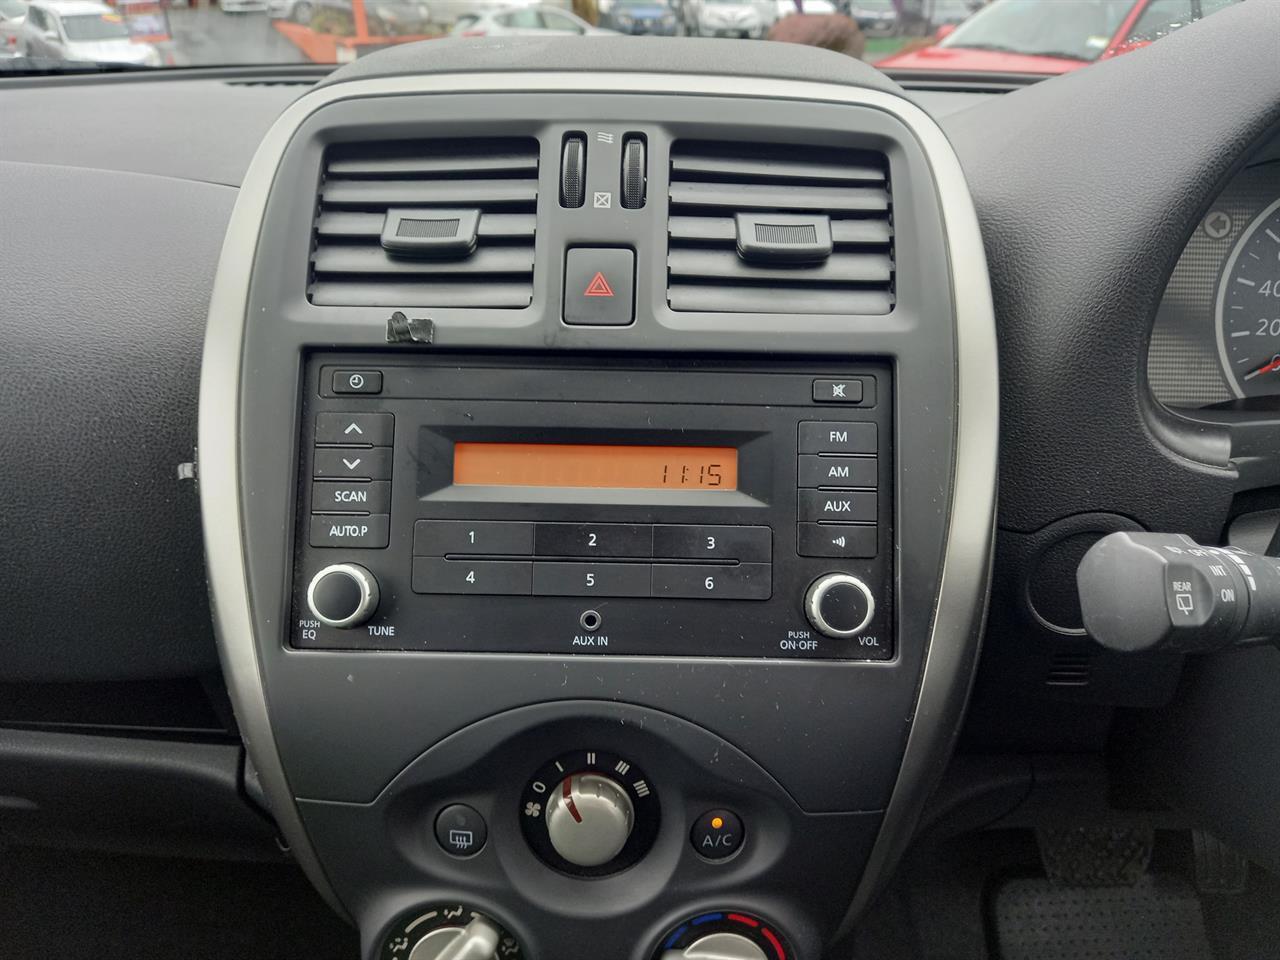 image-14, 2016 Nissan March S Low Km's No Deposit Finance at Dunedin